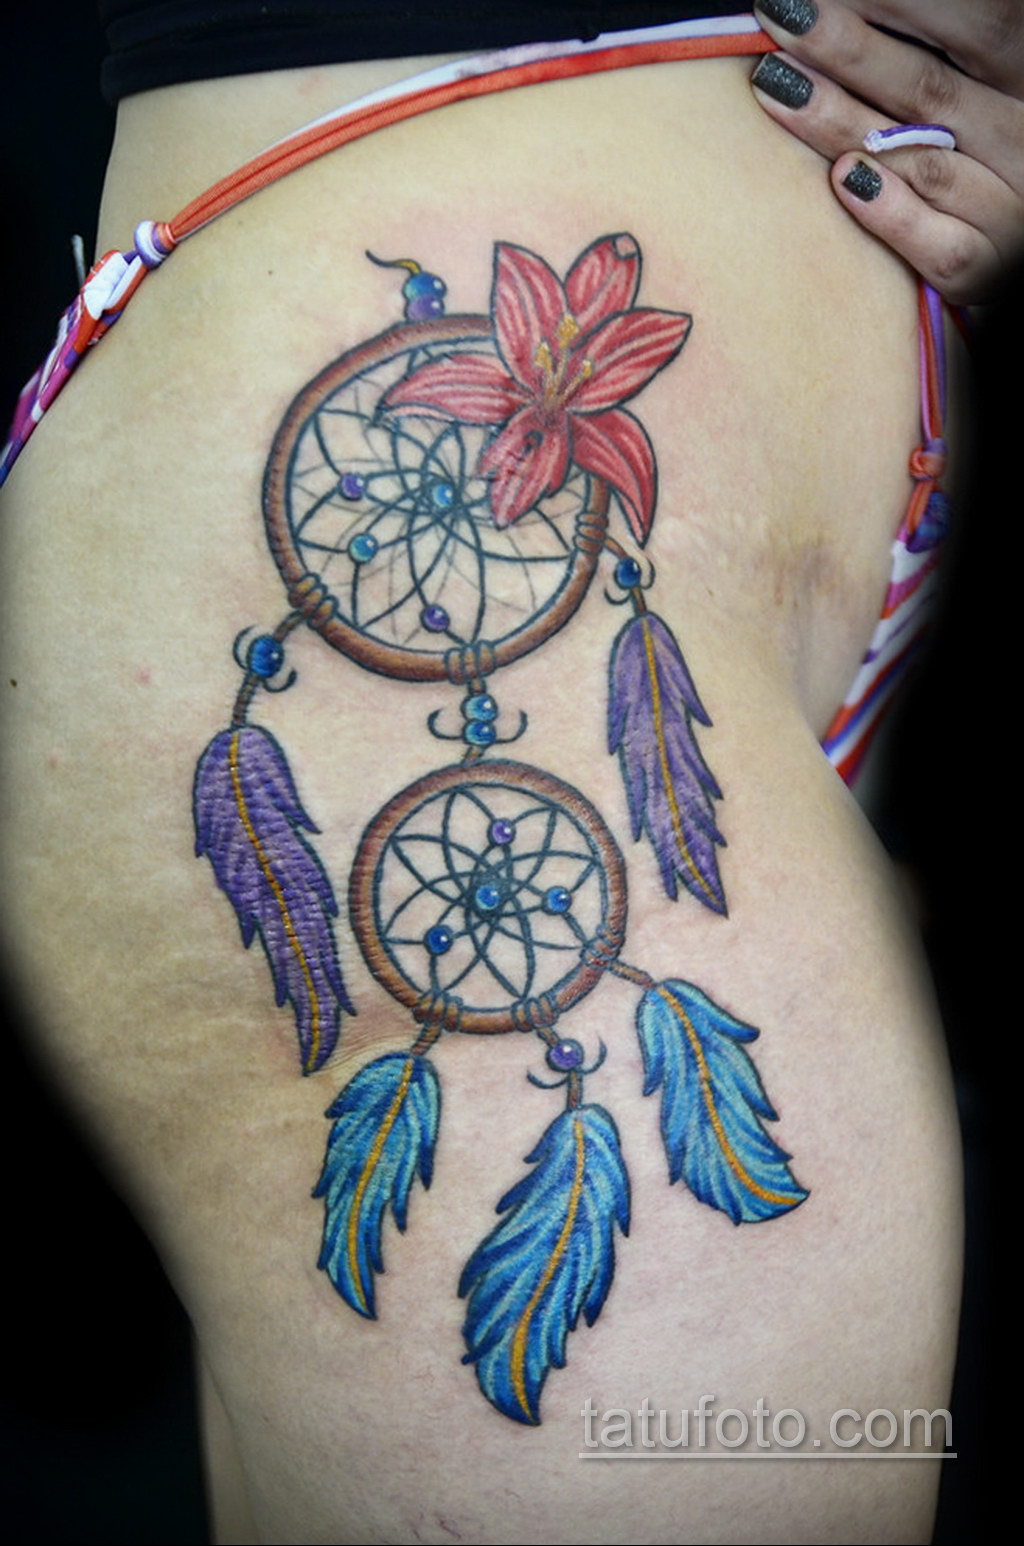 Фото рисунка тату с ловцом снов 22.11.2020 №404 -Dreamcatcher tattoo- tatufoto.com